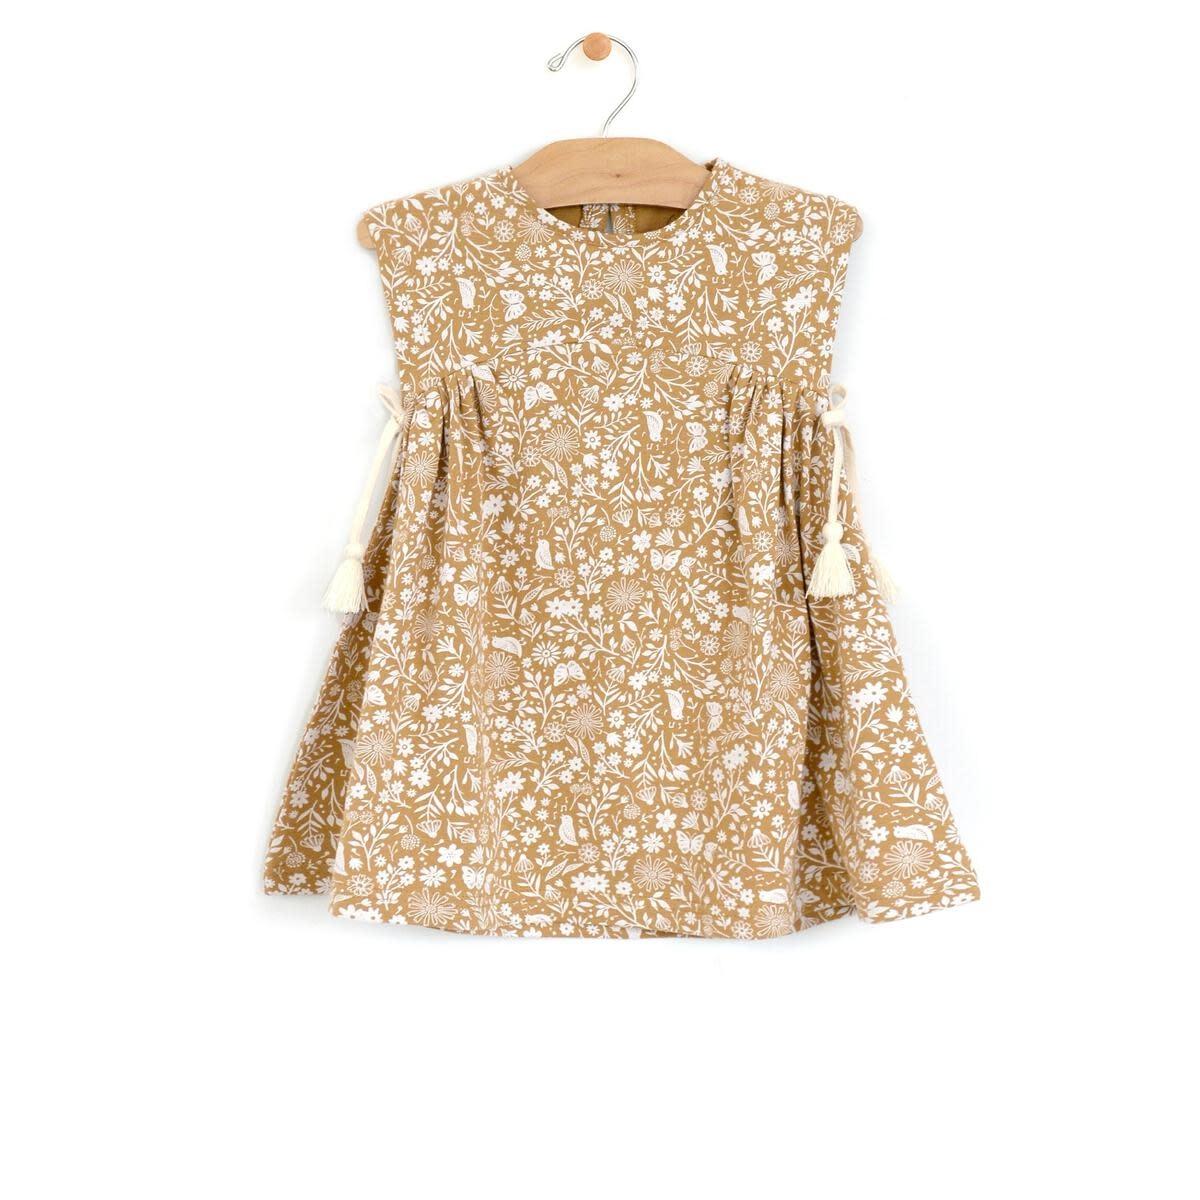 City Mouse Jersey Side Gather Tassel Baby Dress - Golden Garden